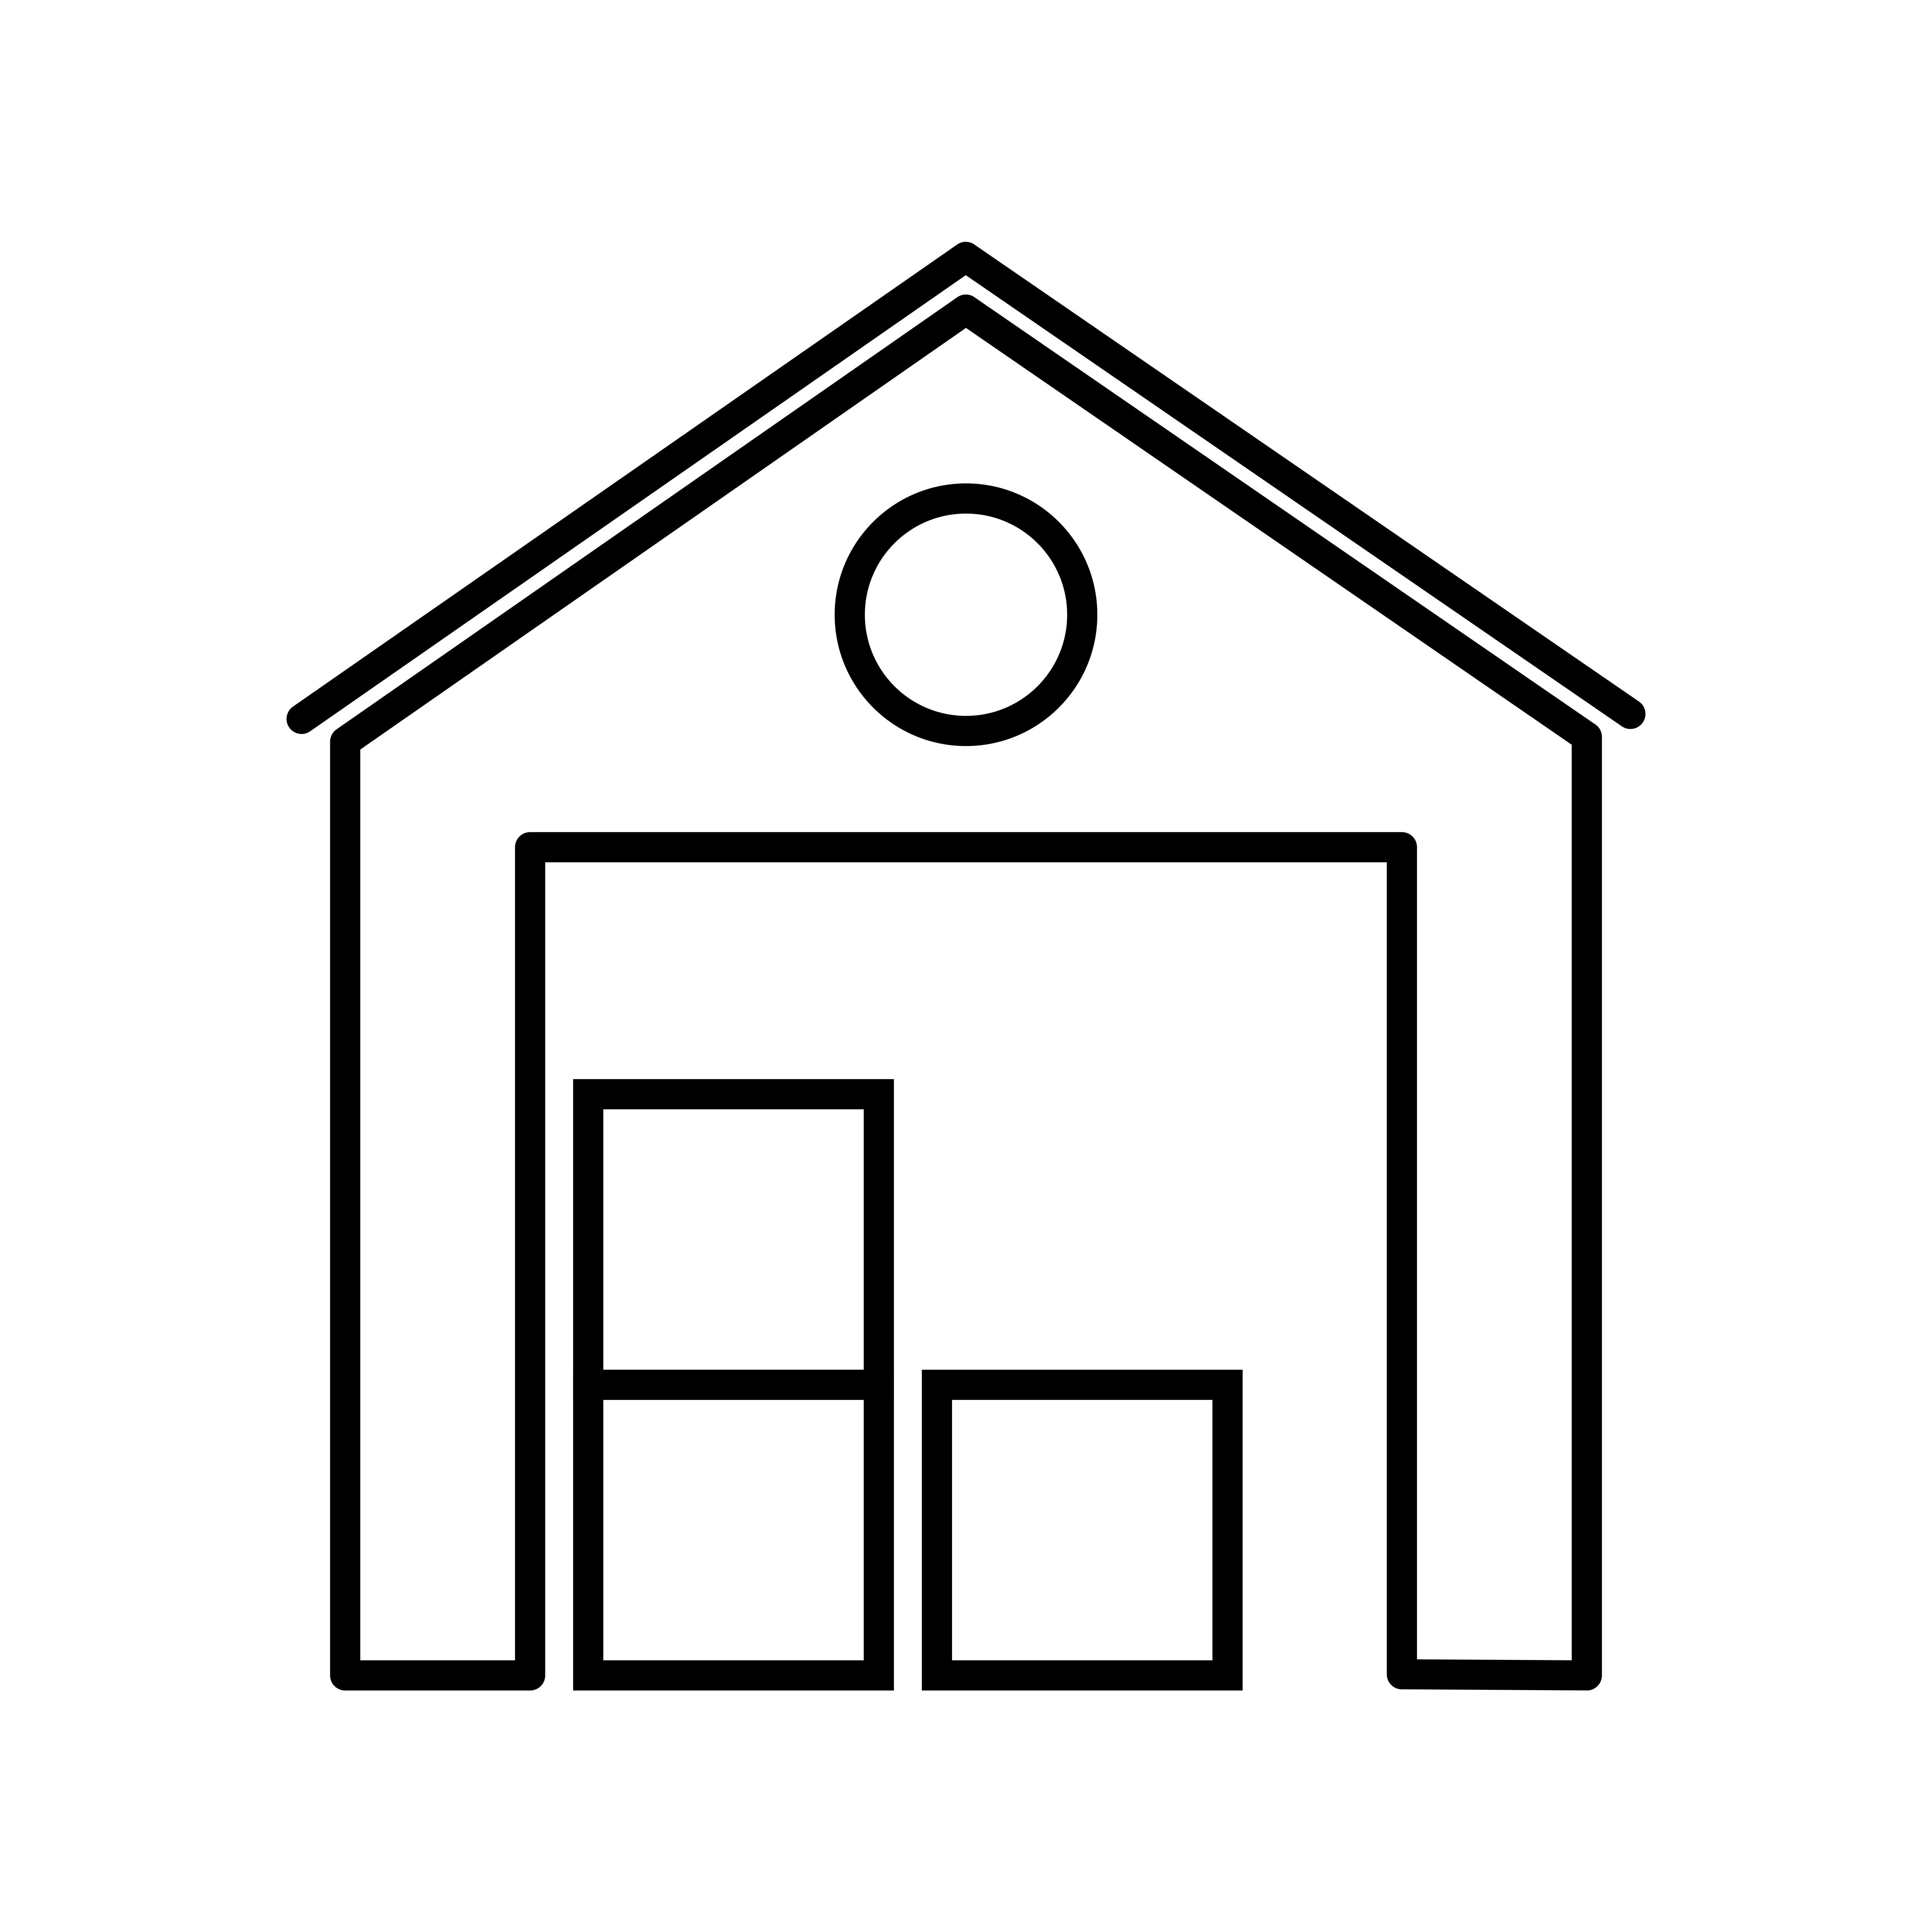 Warehouse Line Black Icon Download Free Vector Art